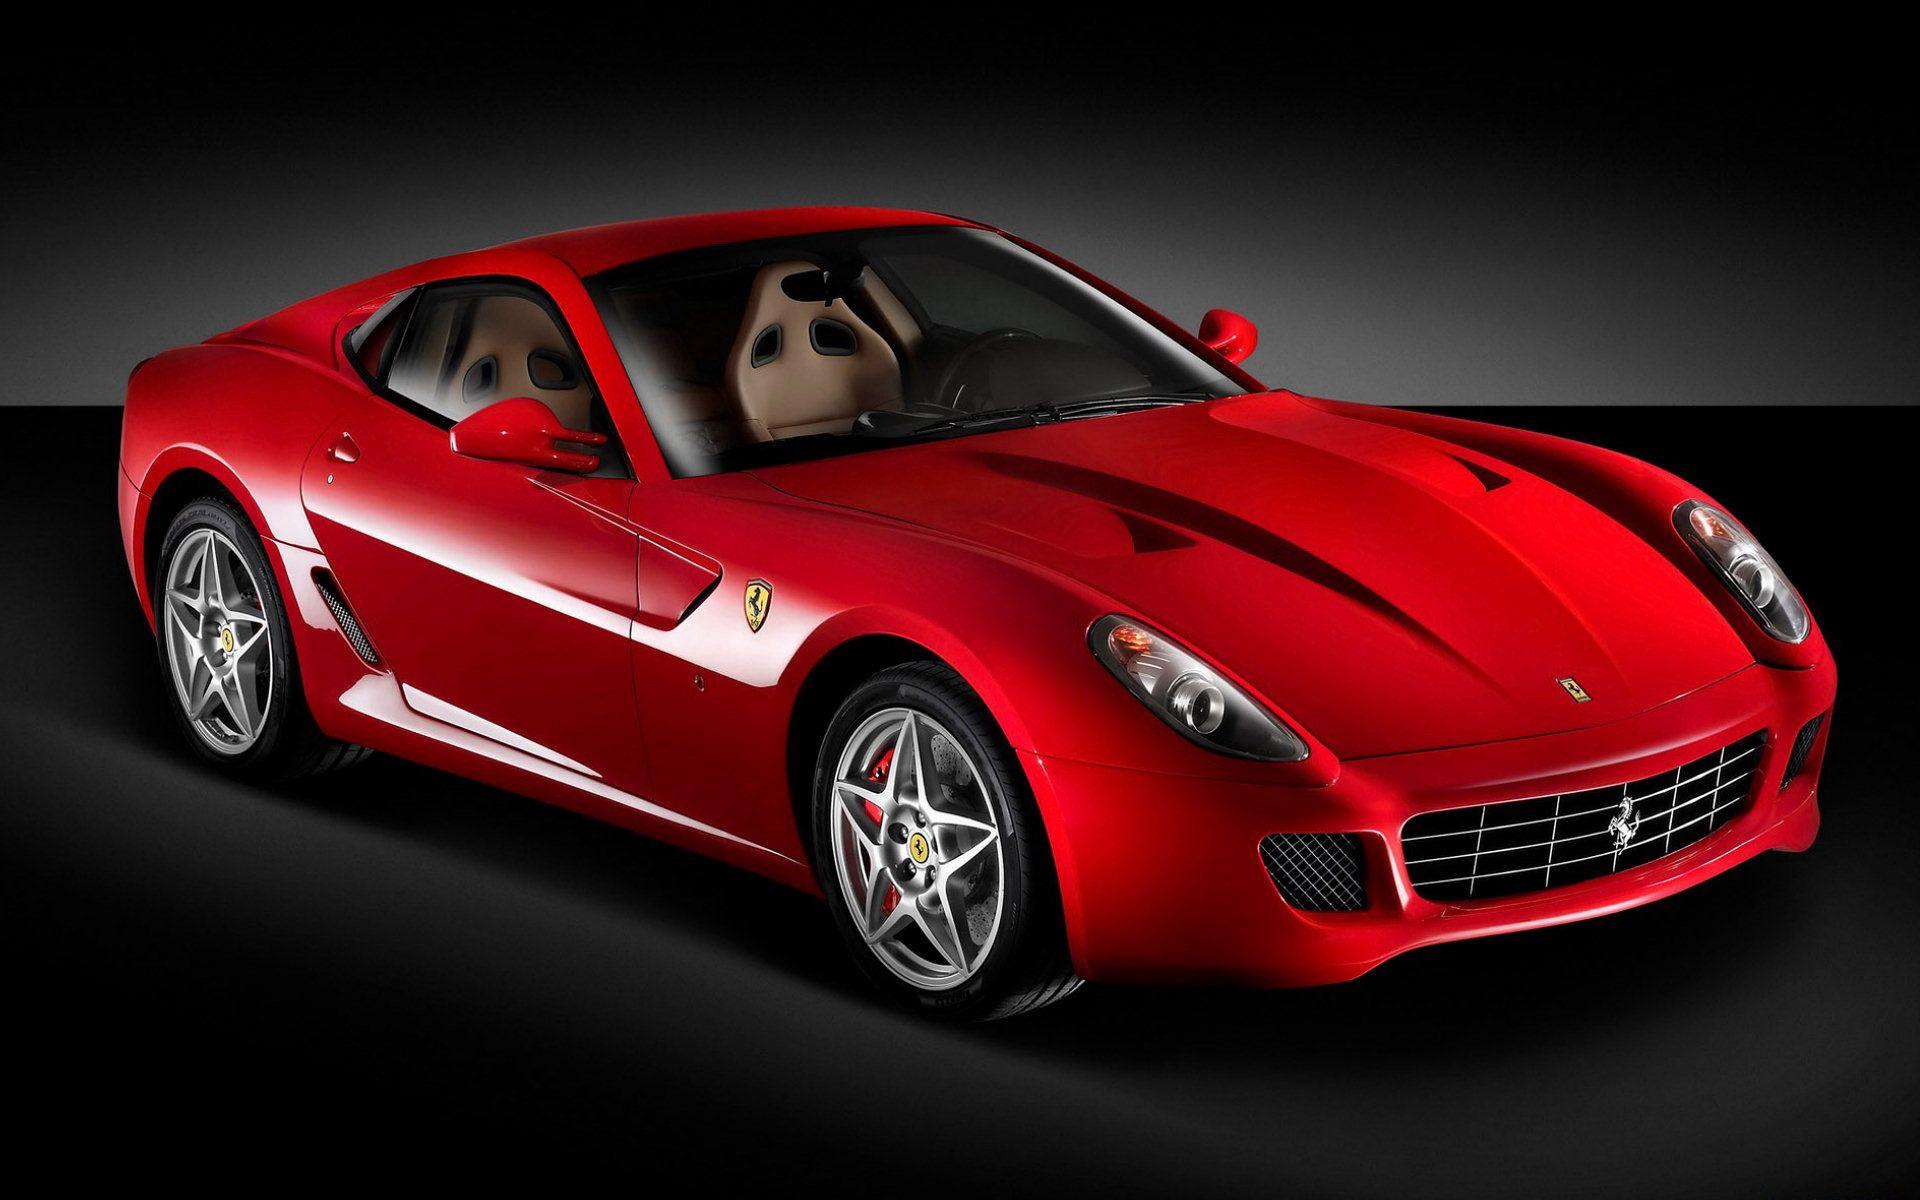 149440 download wallpaper Ferrari, Cars, Scaglietti screensavers and pictures for free